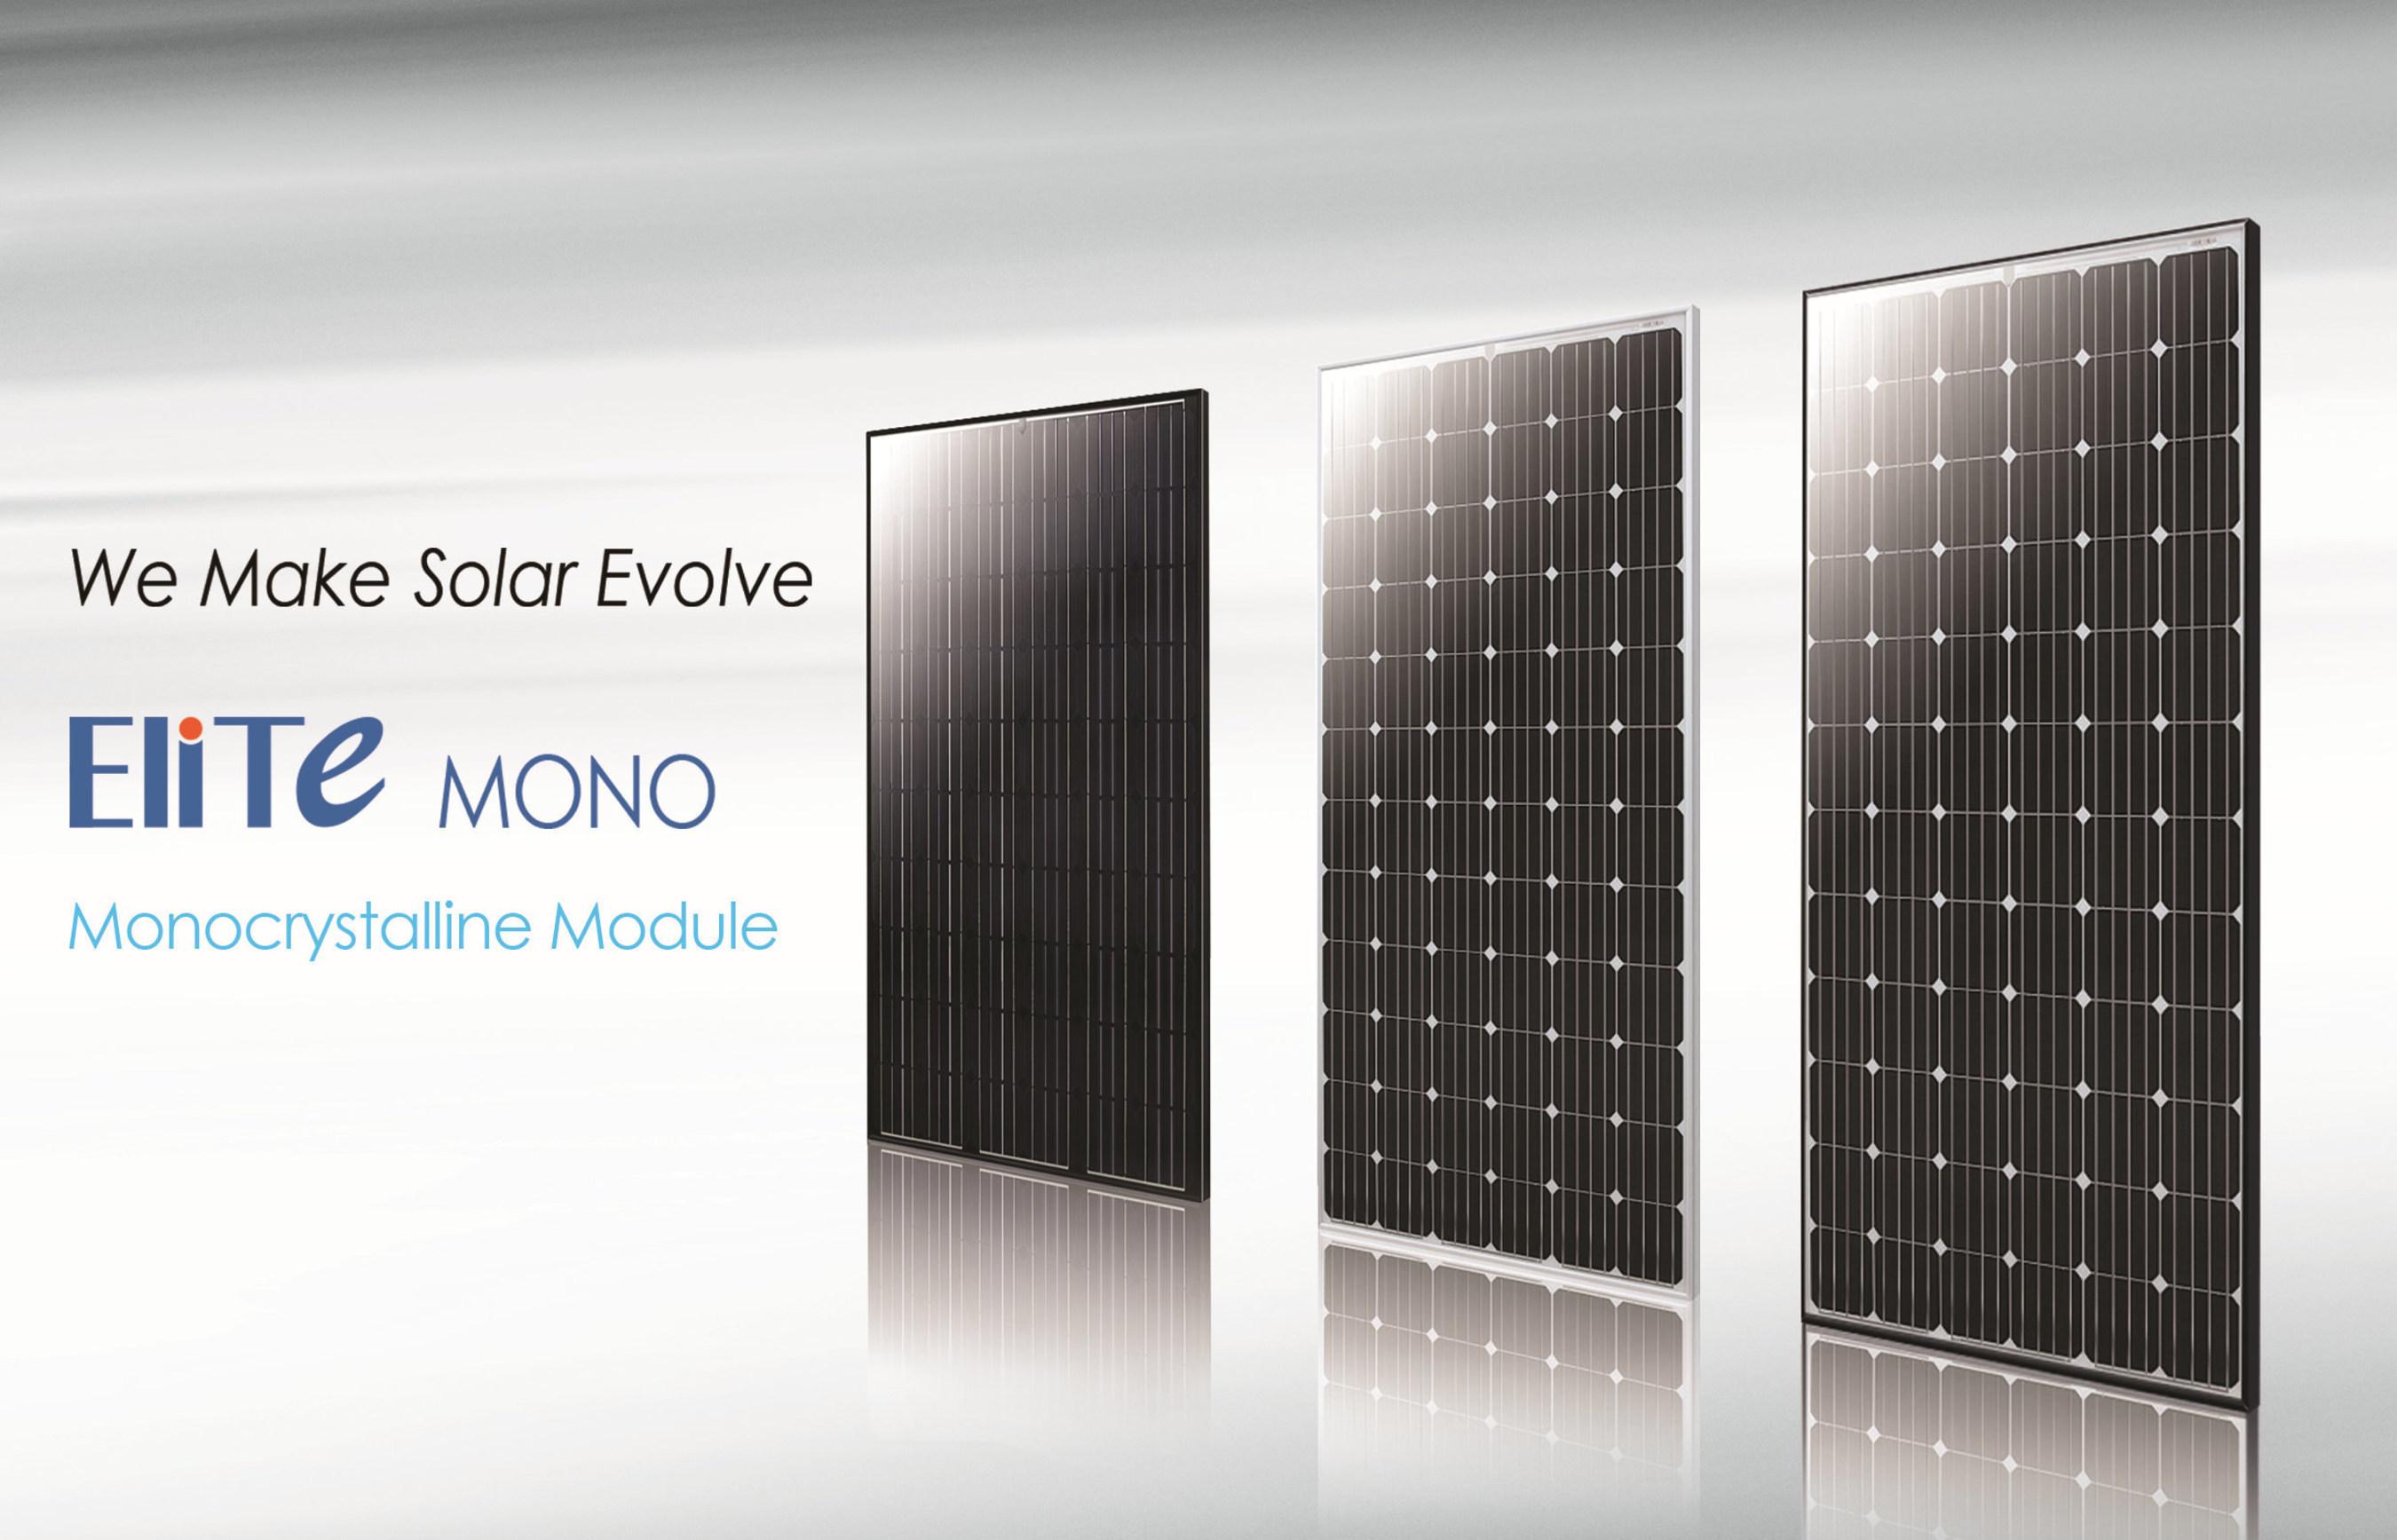 ET Solar Launches EliTe Mono Module Globally